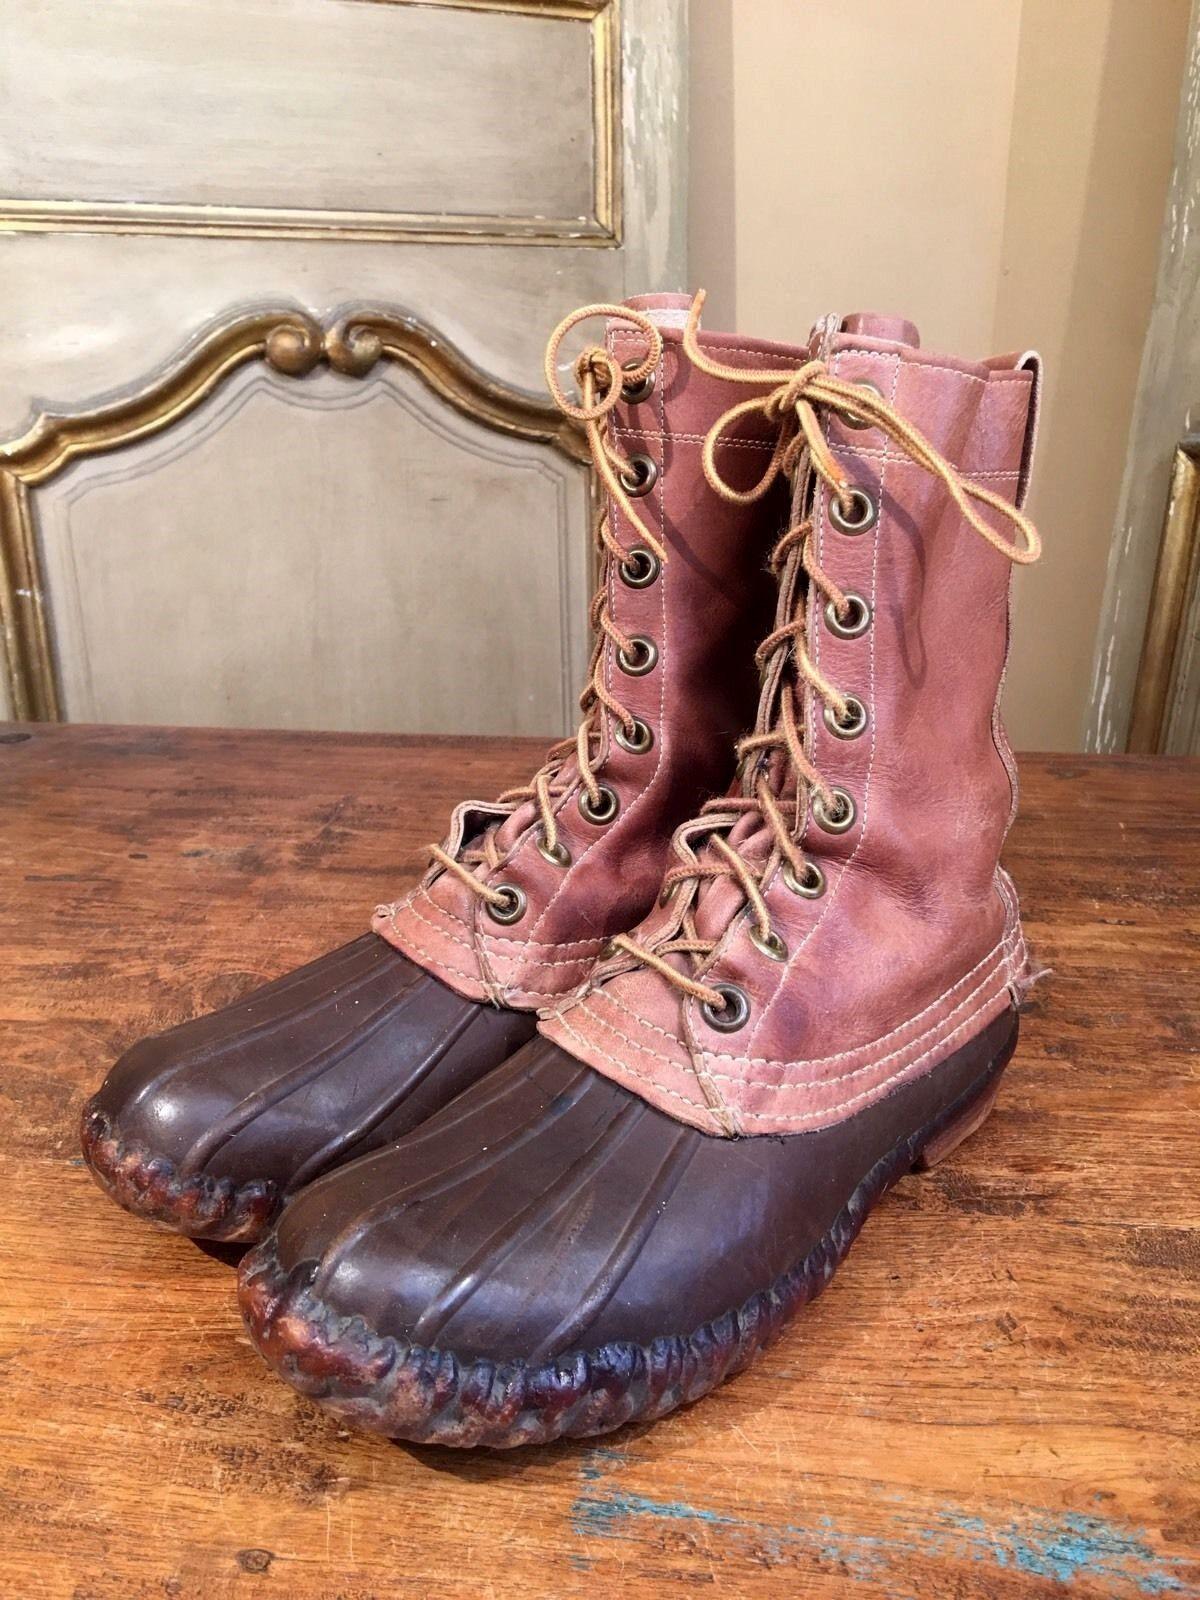 Vintage L.L BEAN MAINE CAZA botas Hombres 6 raro años 60 Etiqueta    OID Stock Perfecto